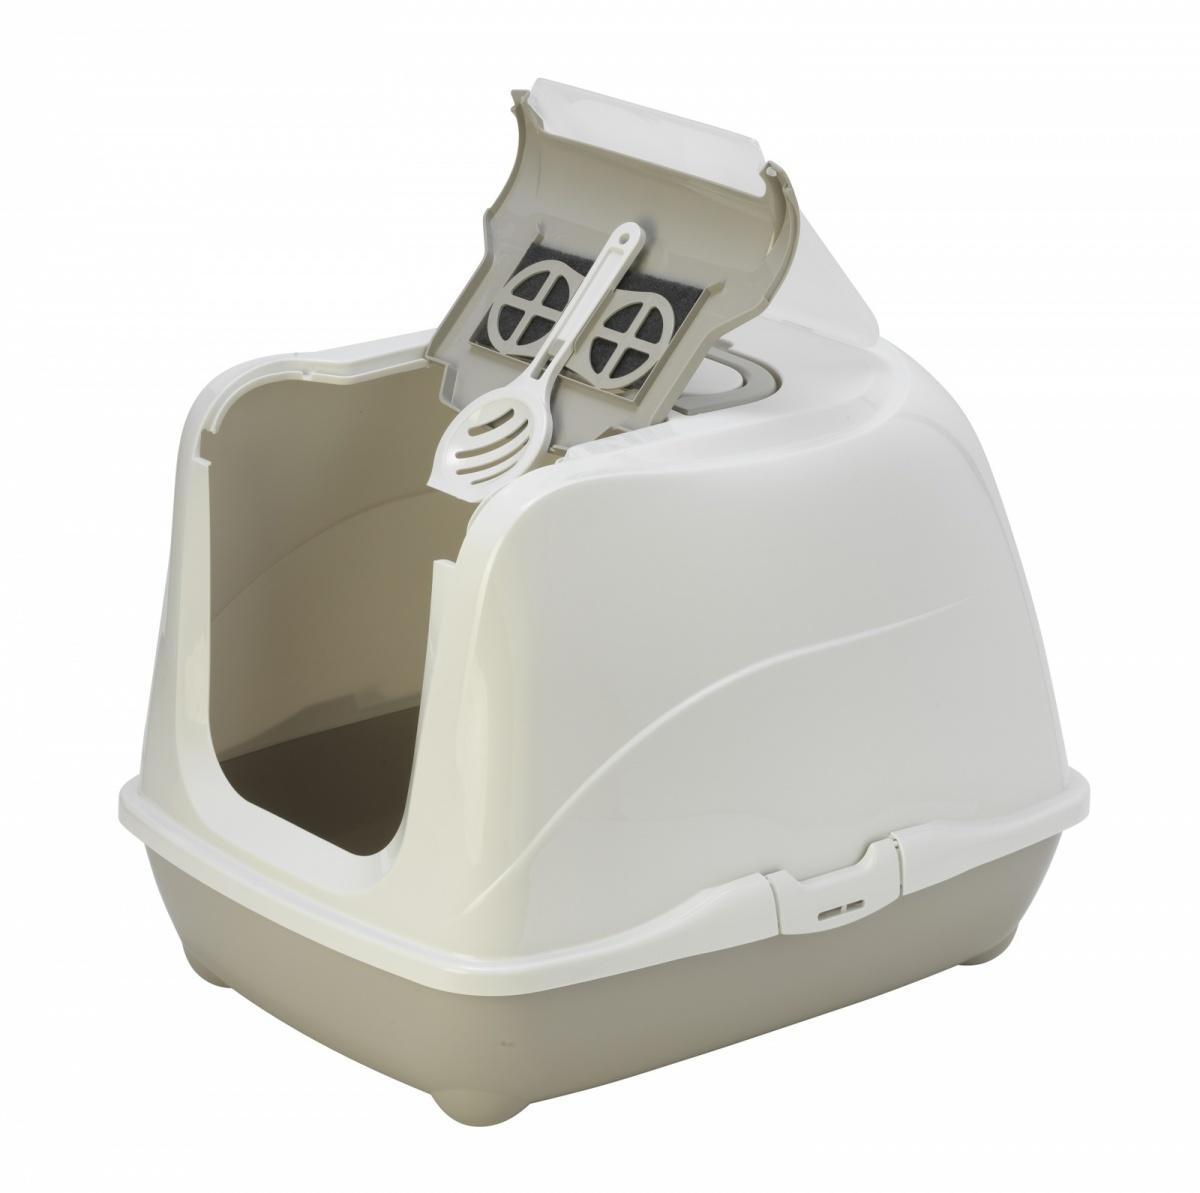 24645/C240-330 MODERNA Туалет-домик Jumbo с угольным фильтром 57х44х41 см теплый серый